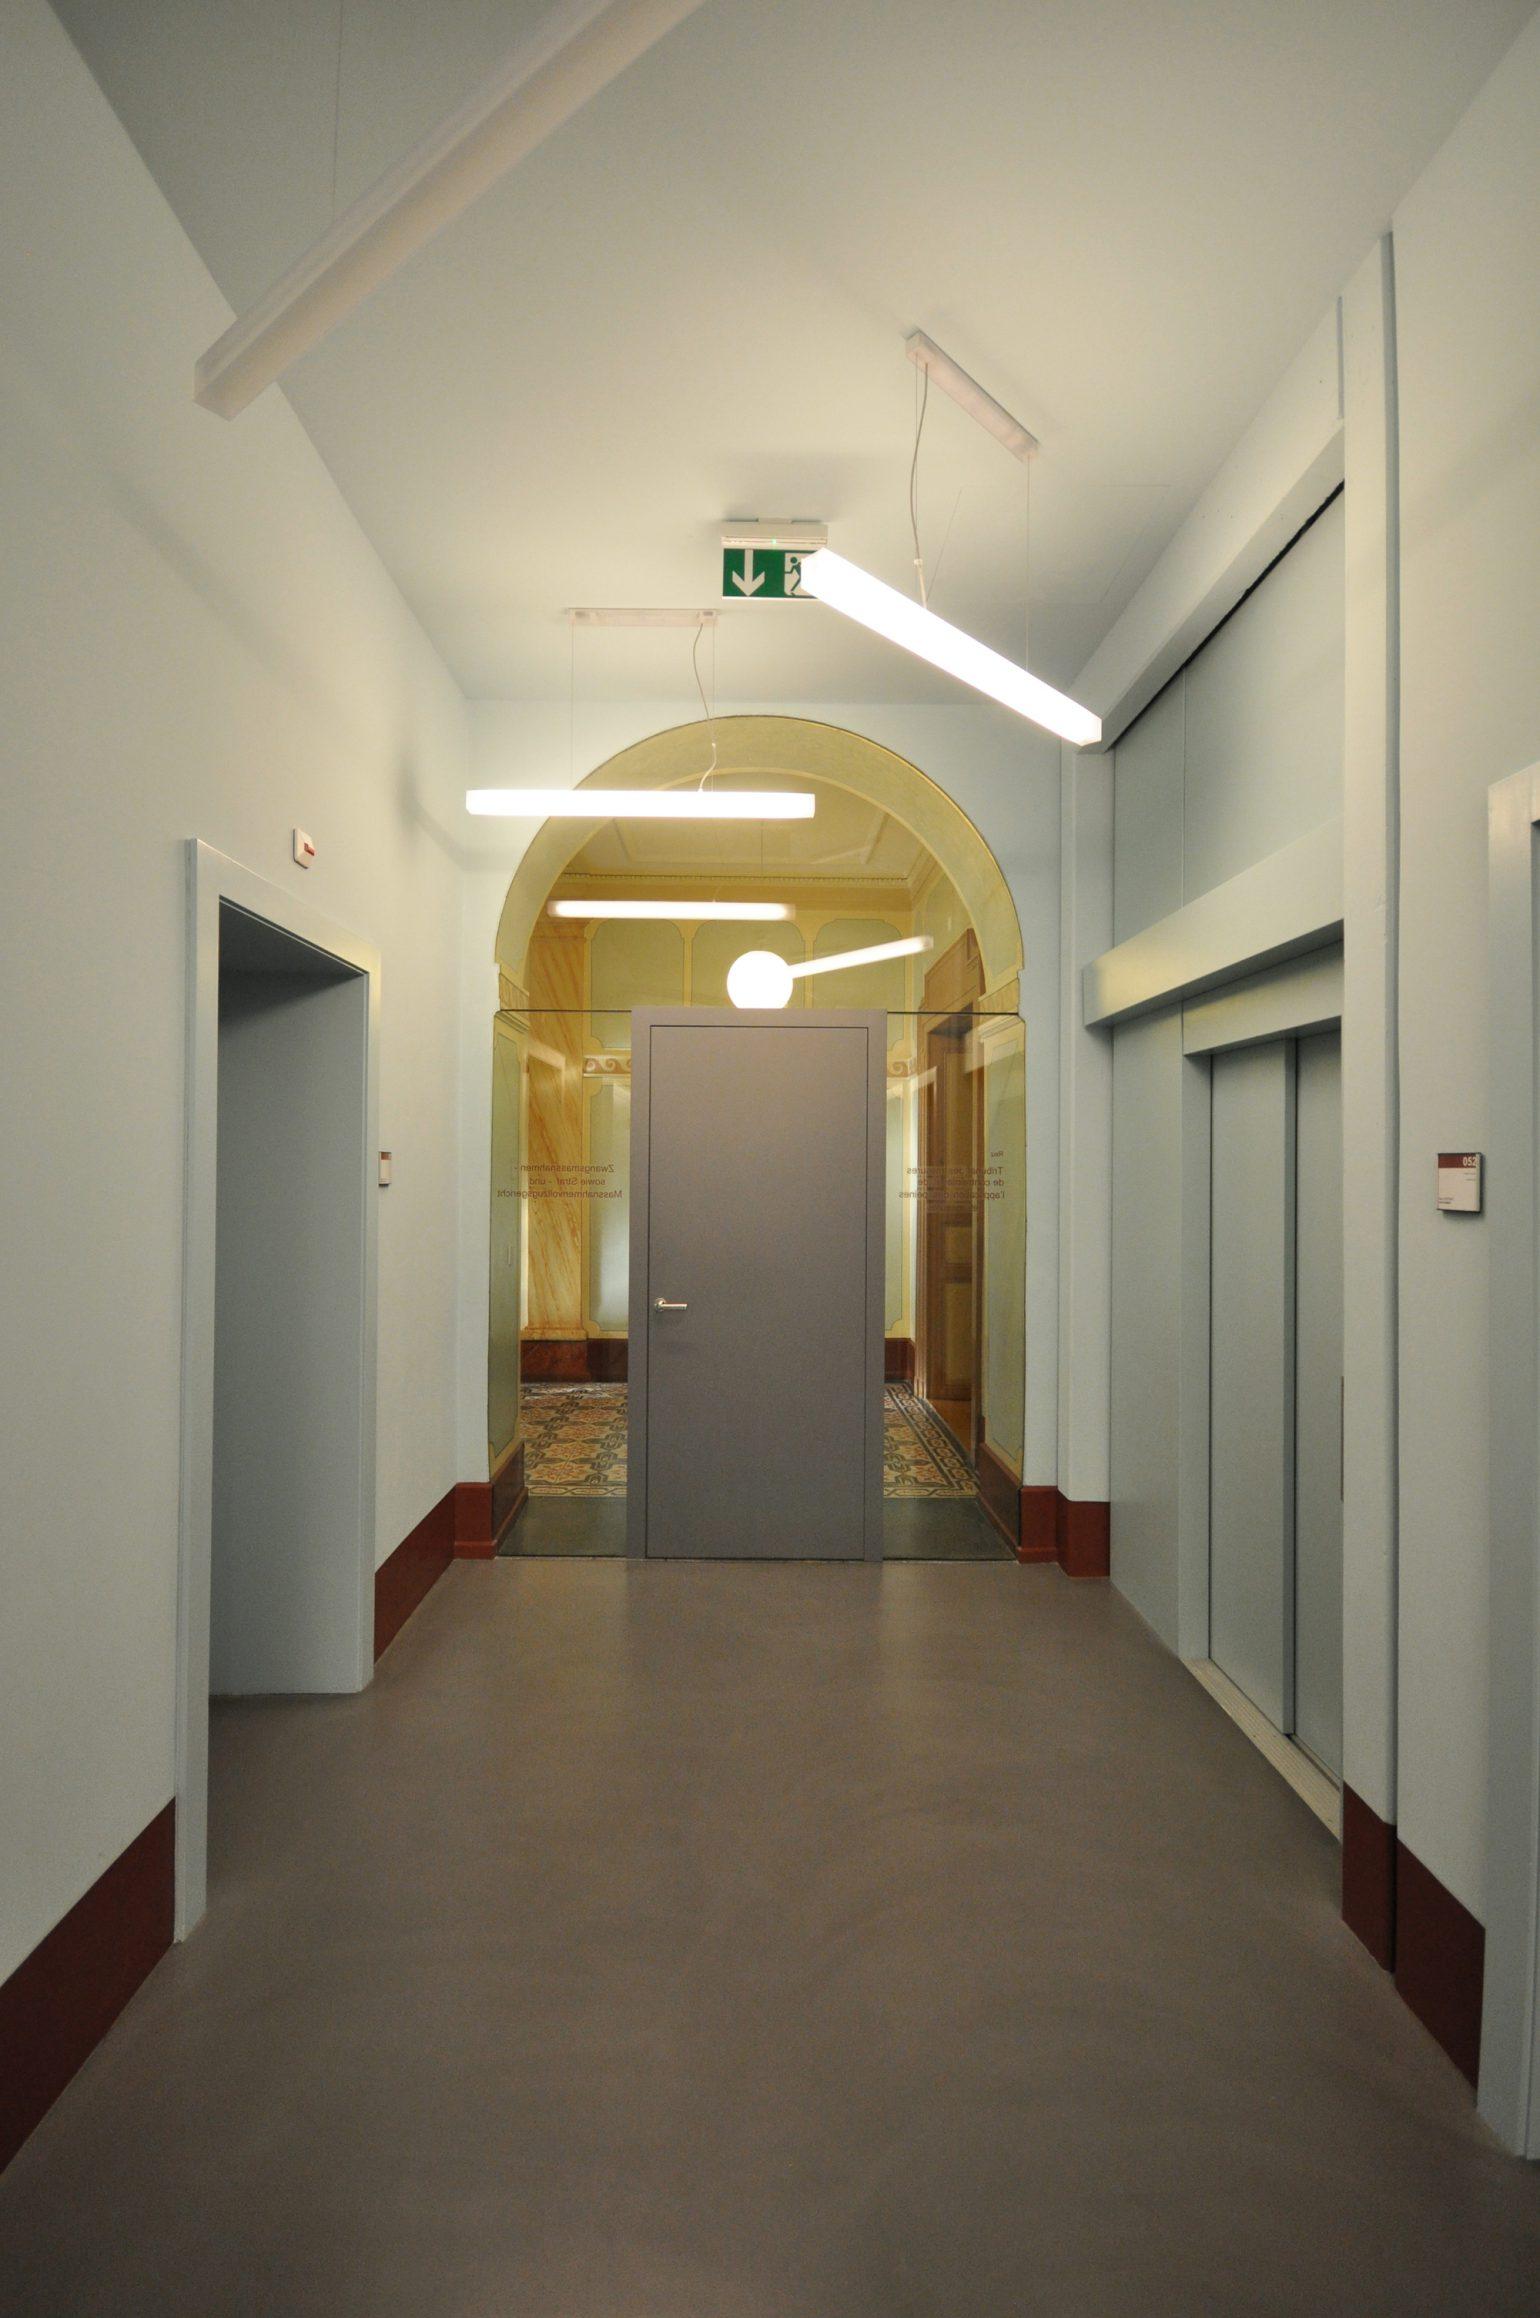 Palais de justice meyer architecture sion for Meyer architecture